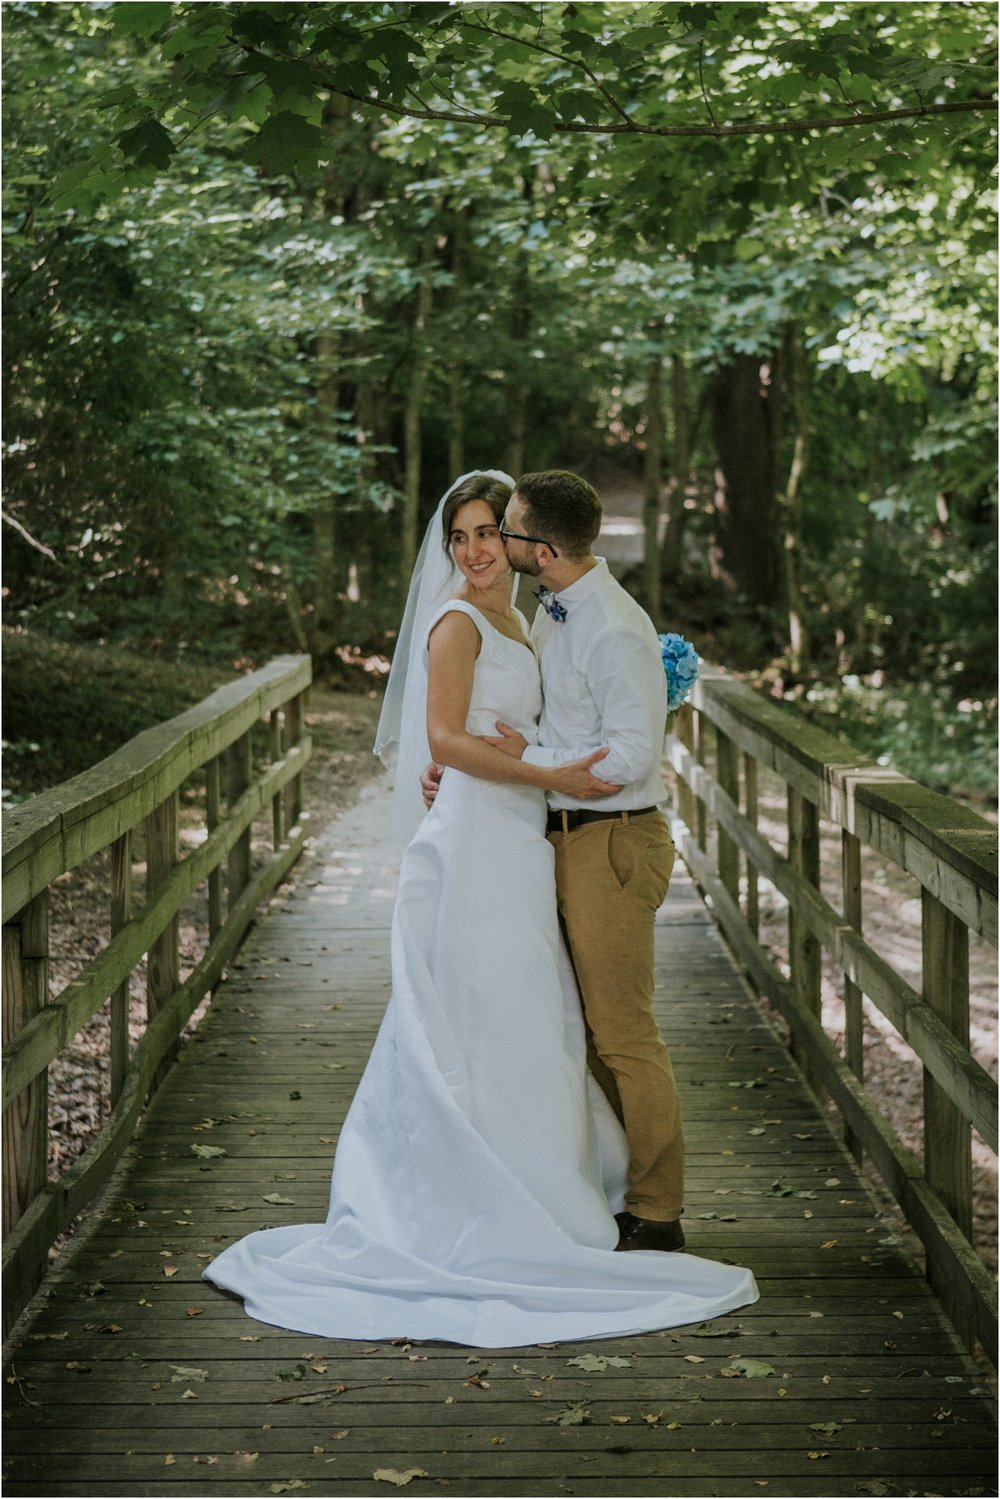 sugar-hollow-park-bristol-virginia-wedding-intimate-woodsy-black-forest-ceremony-adventurous-couple_0059.jpg